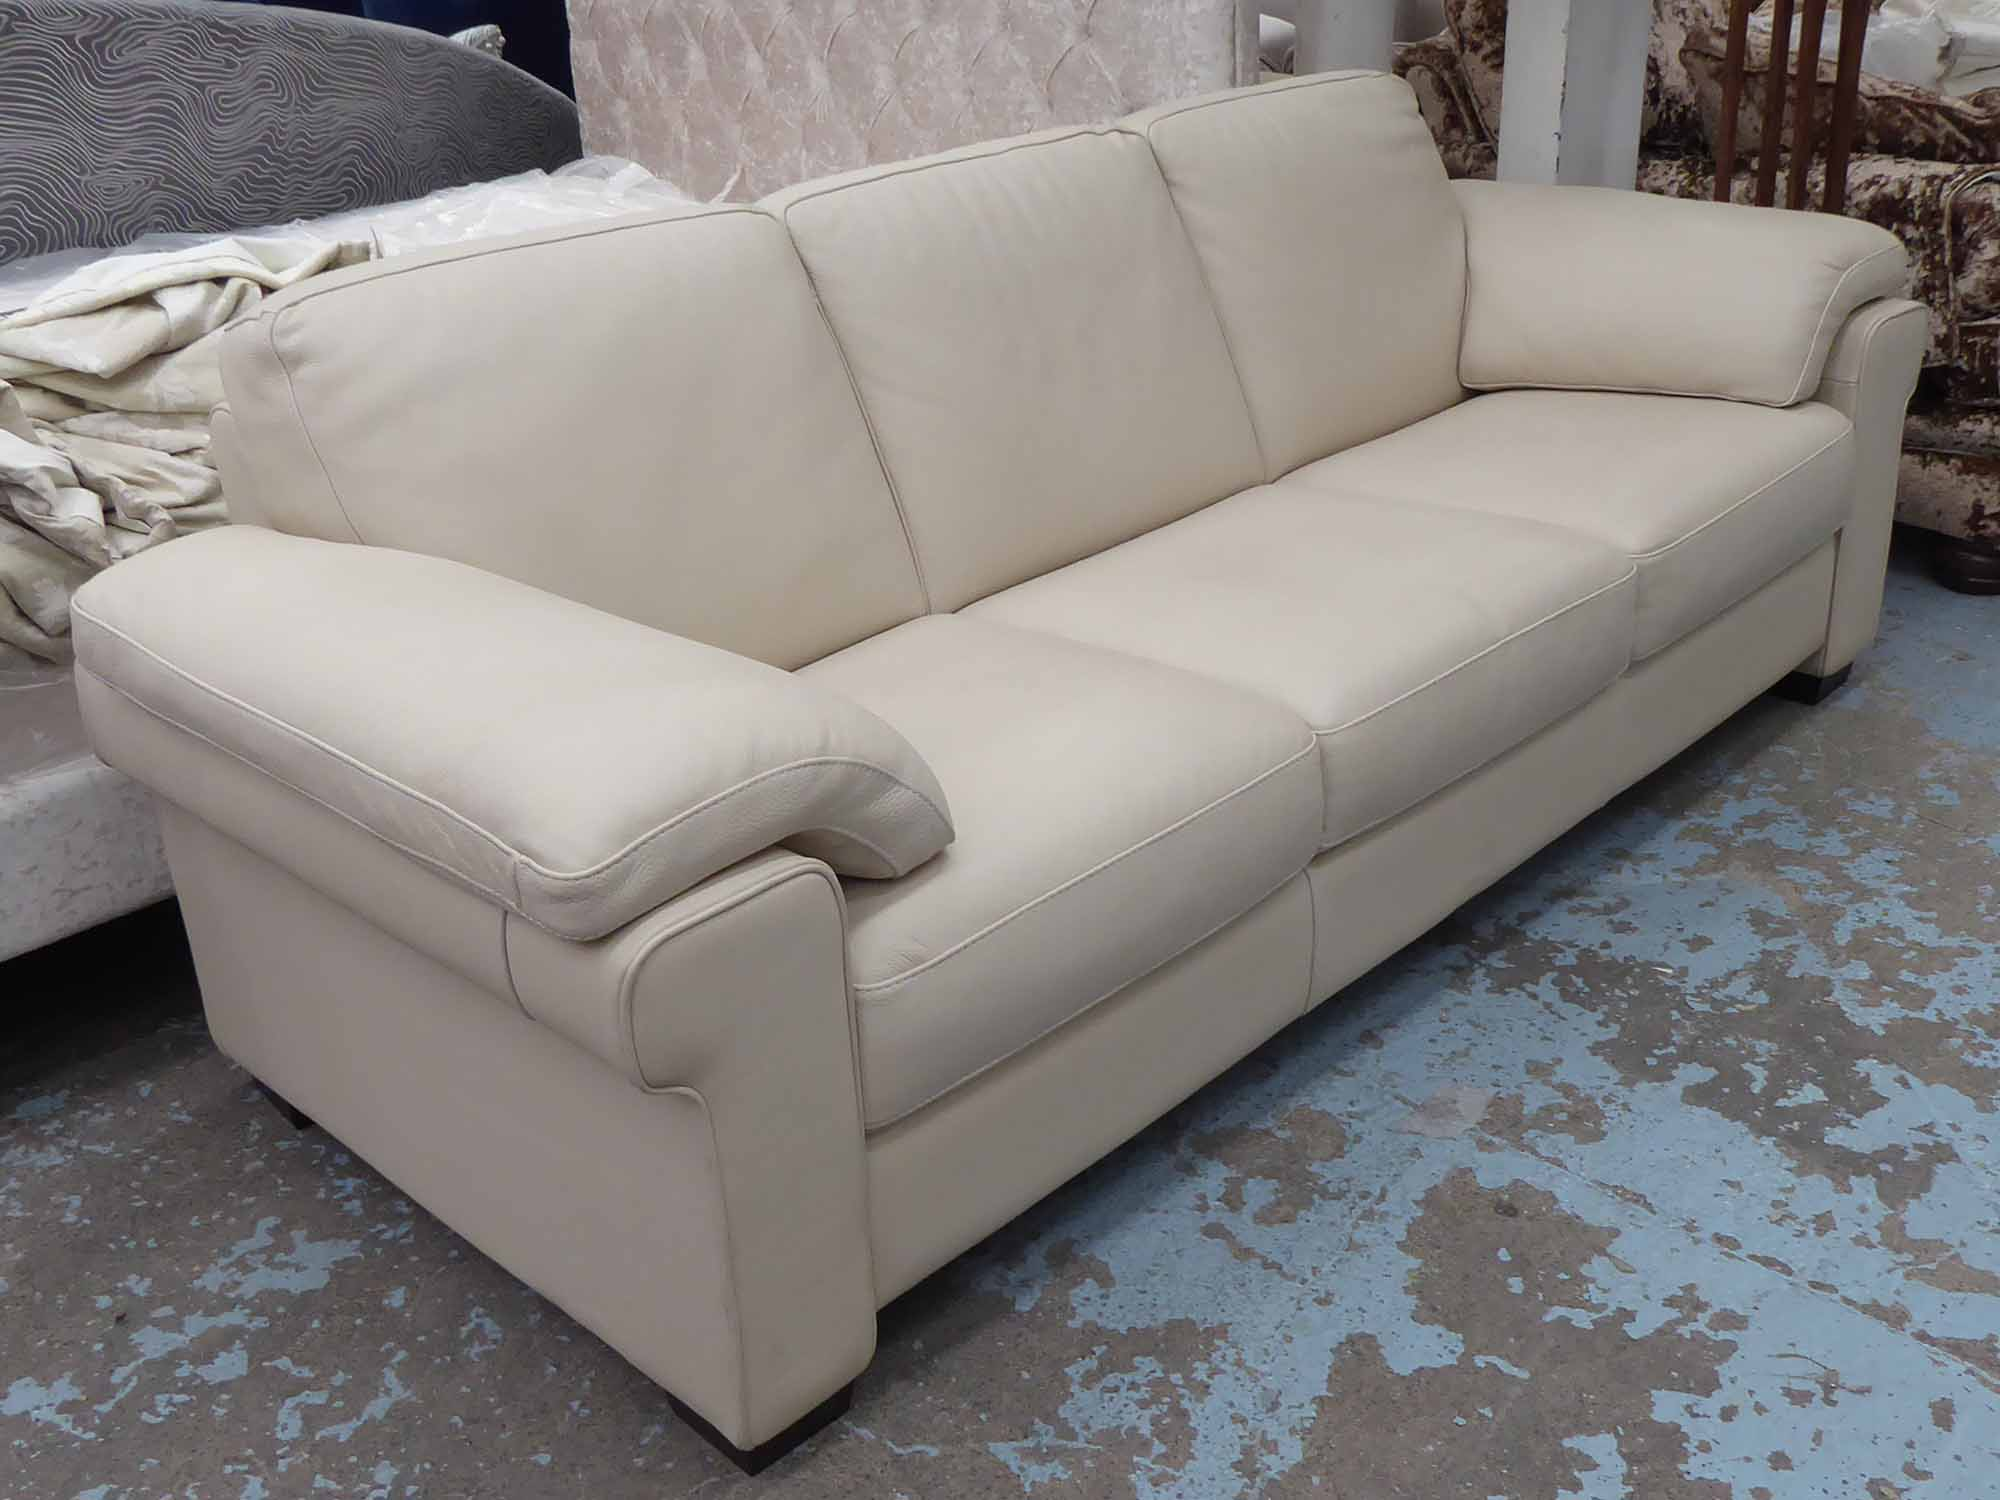 Picture of: Natuzzi Sofa Three Seater Cream Leather 230cm W X 92cm D